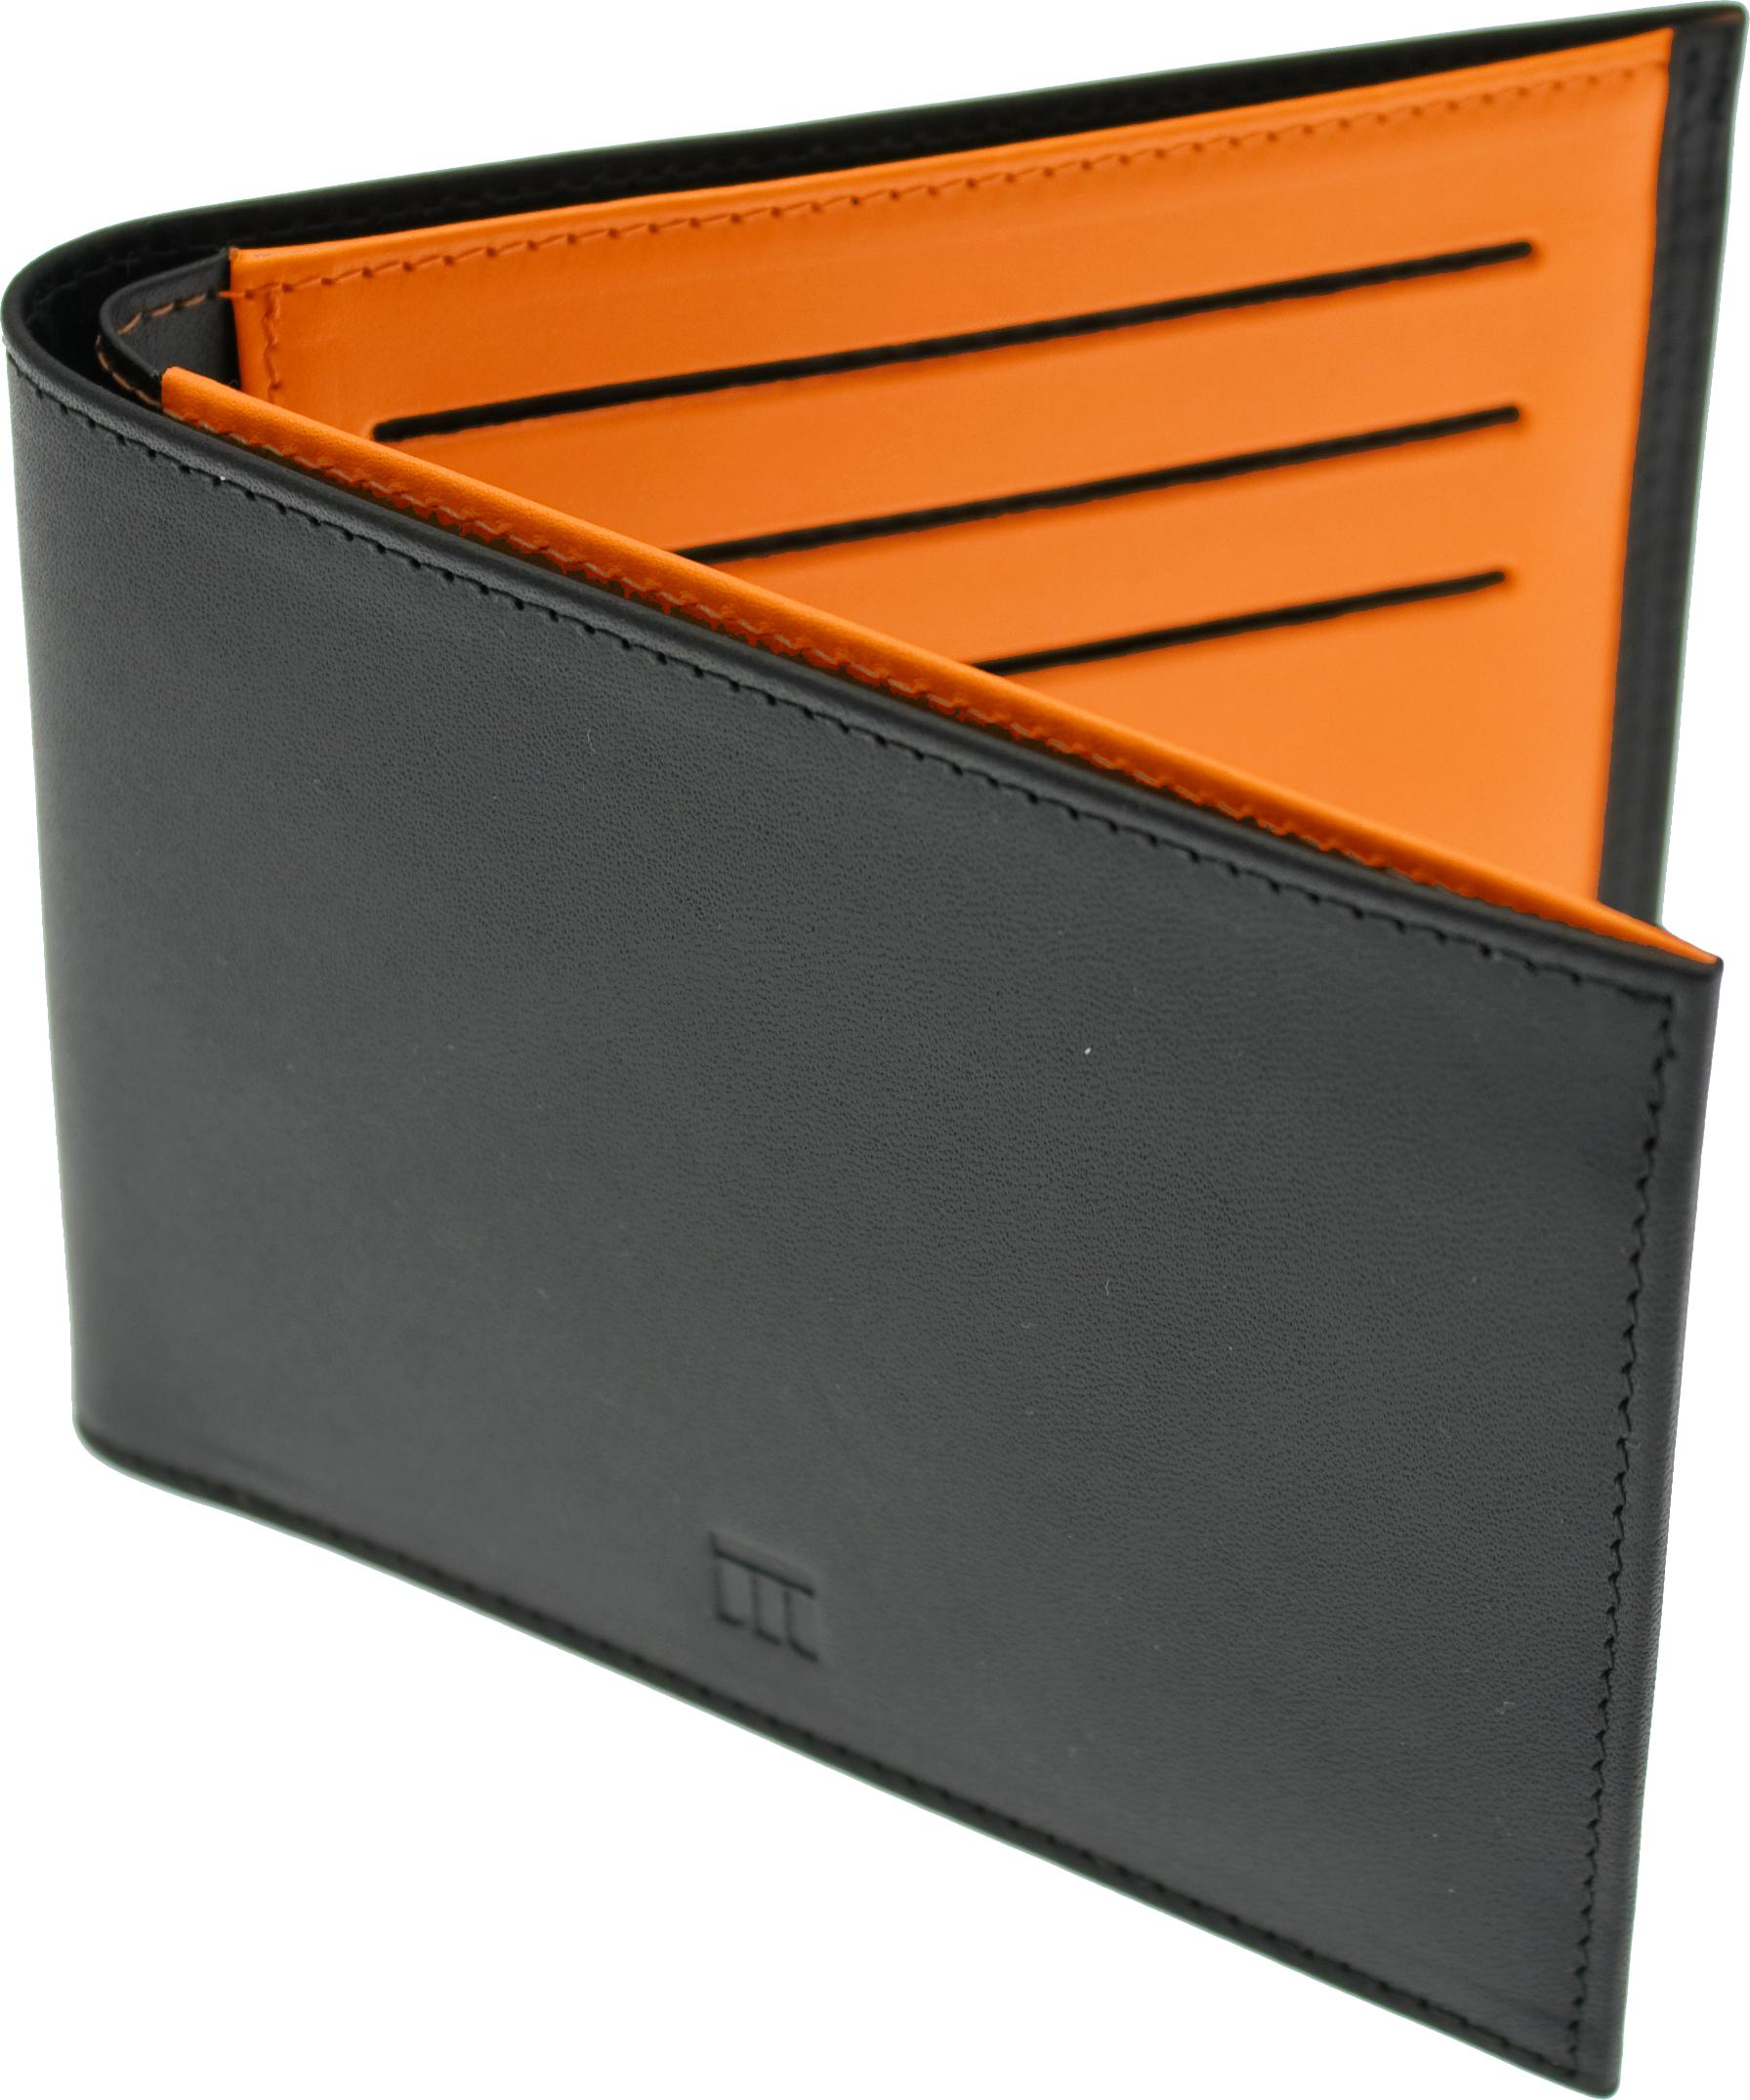 Wallet HD PNG - 96574